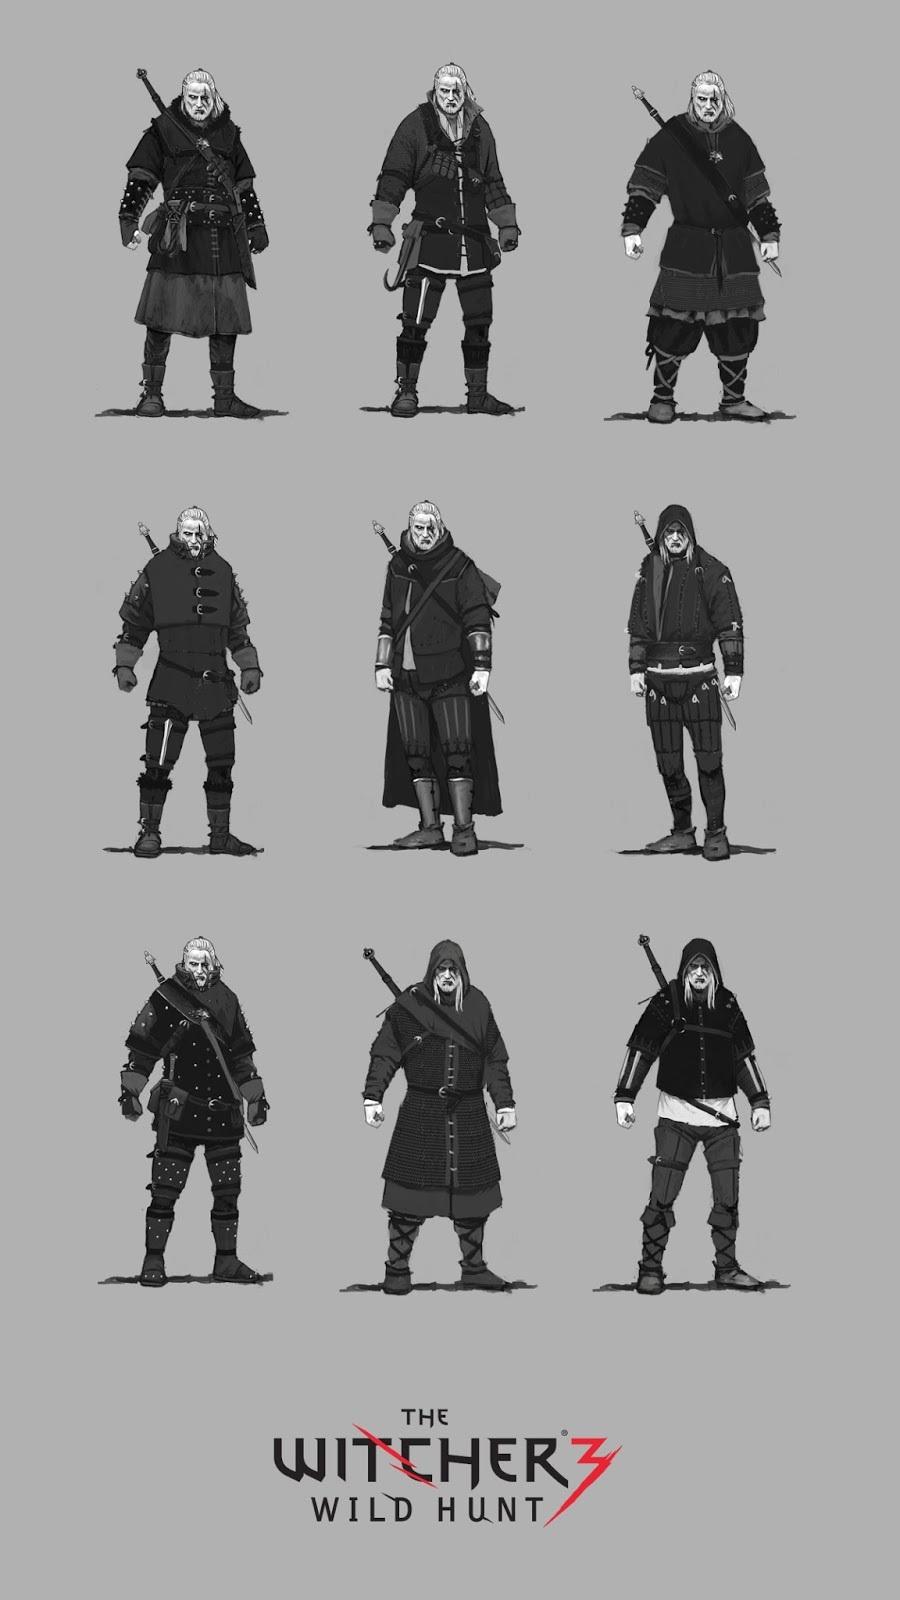 The-Witcher-3-Wild-Hunt-1391243168787090